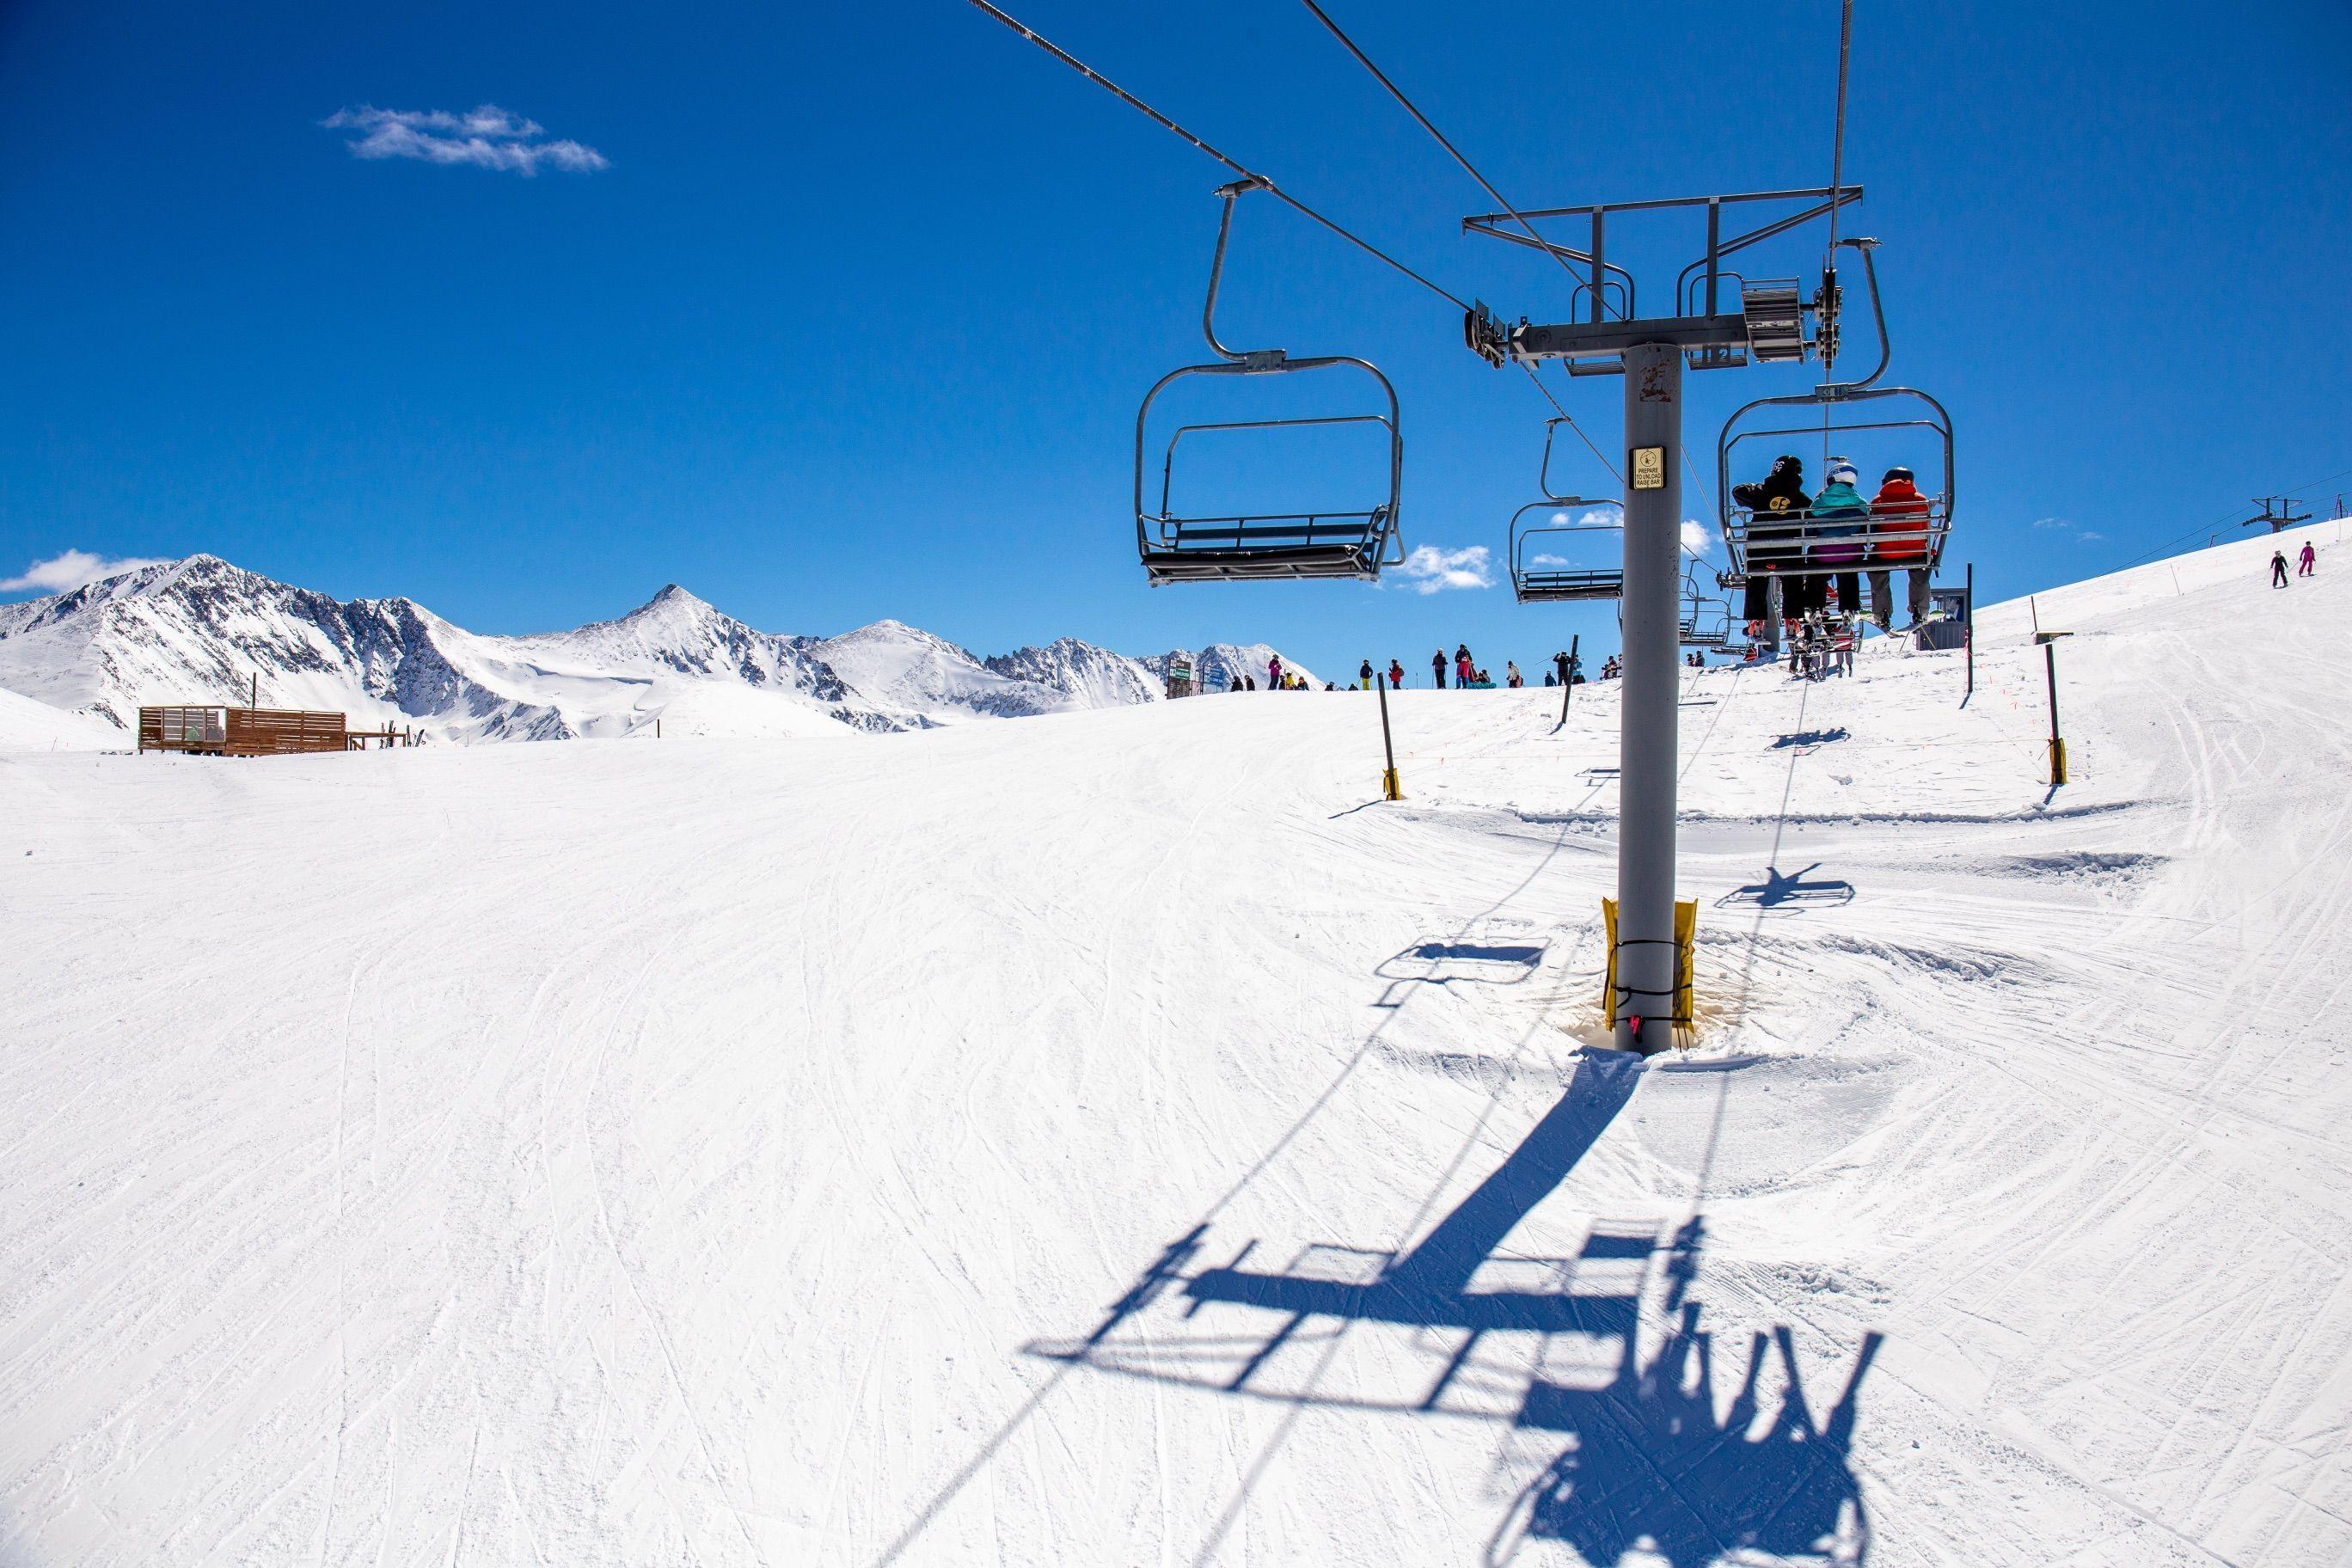 Follow Us On Instagram Colorado Ski Resort Landscape Photography Drone Nature Ski Lift Gon Colorado Ski Resorts Copper Mountain Ski Resort Colorado Skiing